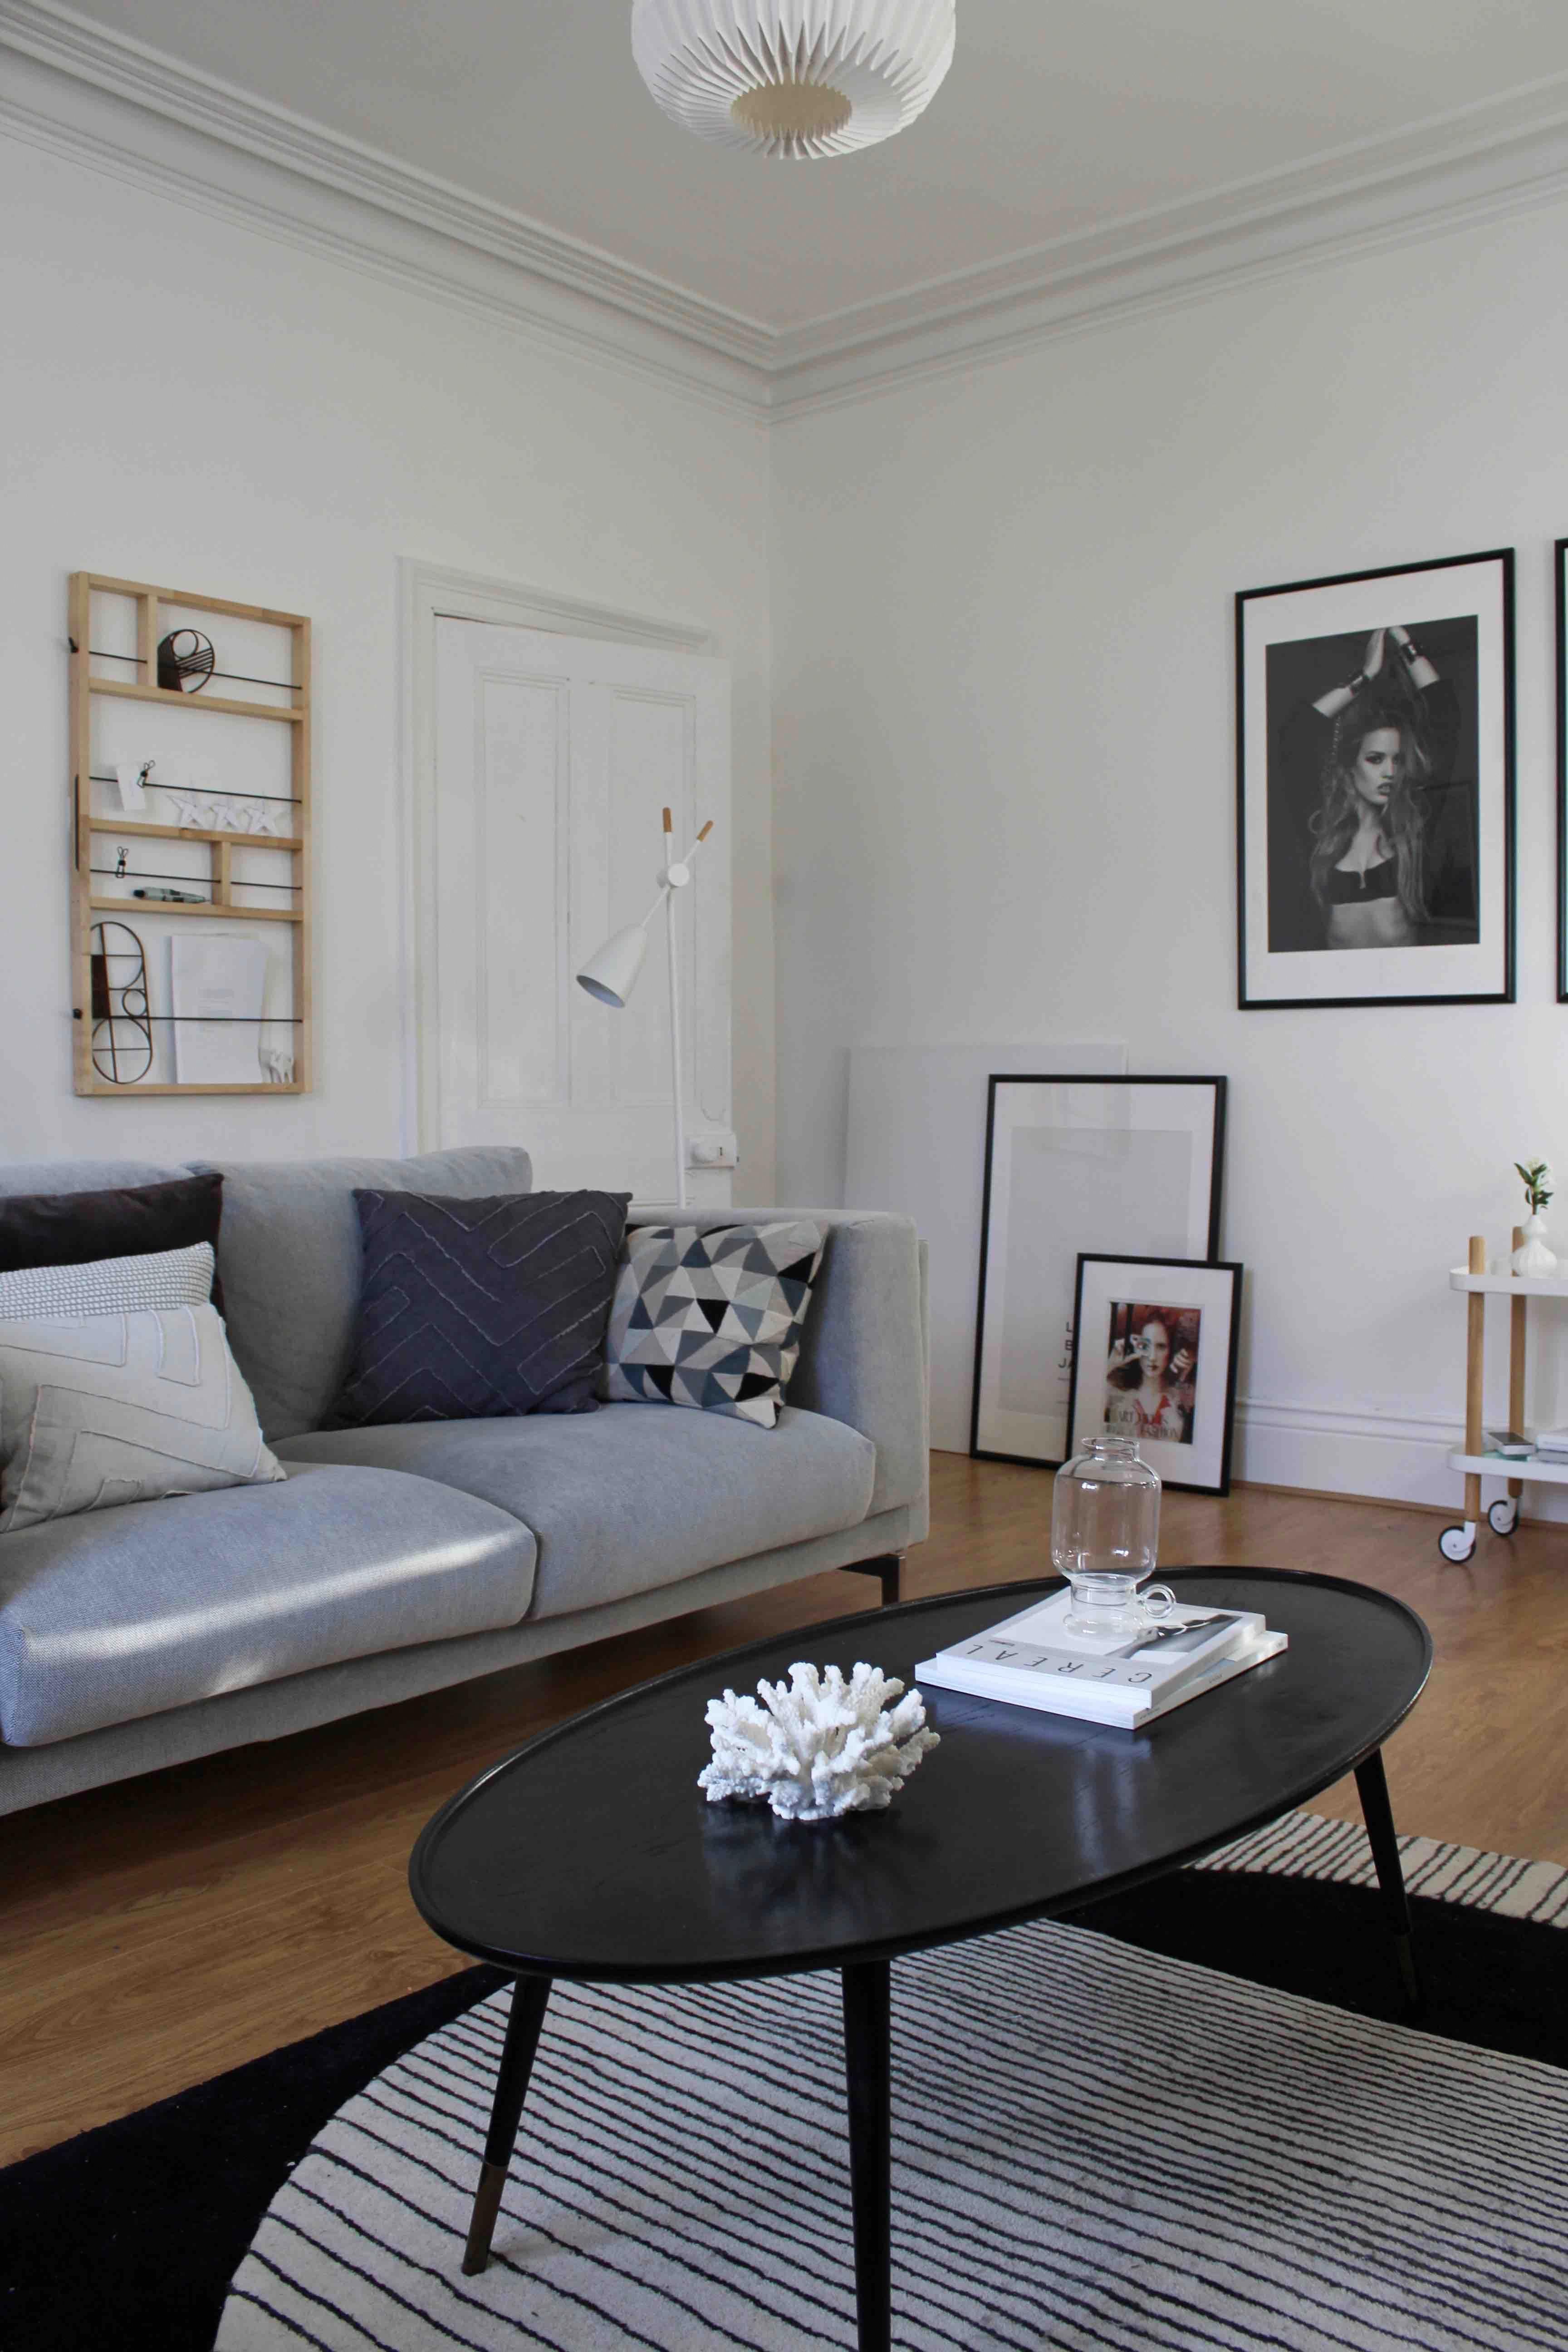 Scandinavian Style Living Room With Grey Sofa Black Coffee Table White Walls And A Warm Oak Wooden Floor Wohnzimmer Grau Wohnzimmer Weiss Wohnzimmermobel Weiss